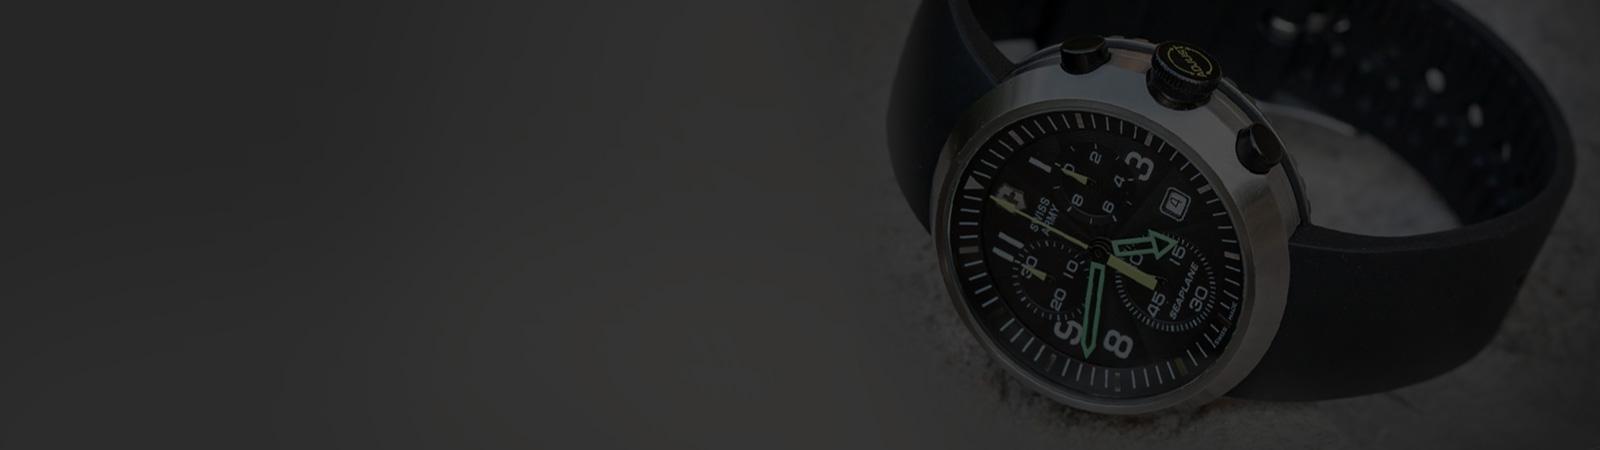 MEET THE WATCH: Victorinox Swiss Army SeaPlane Chronograph